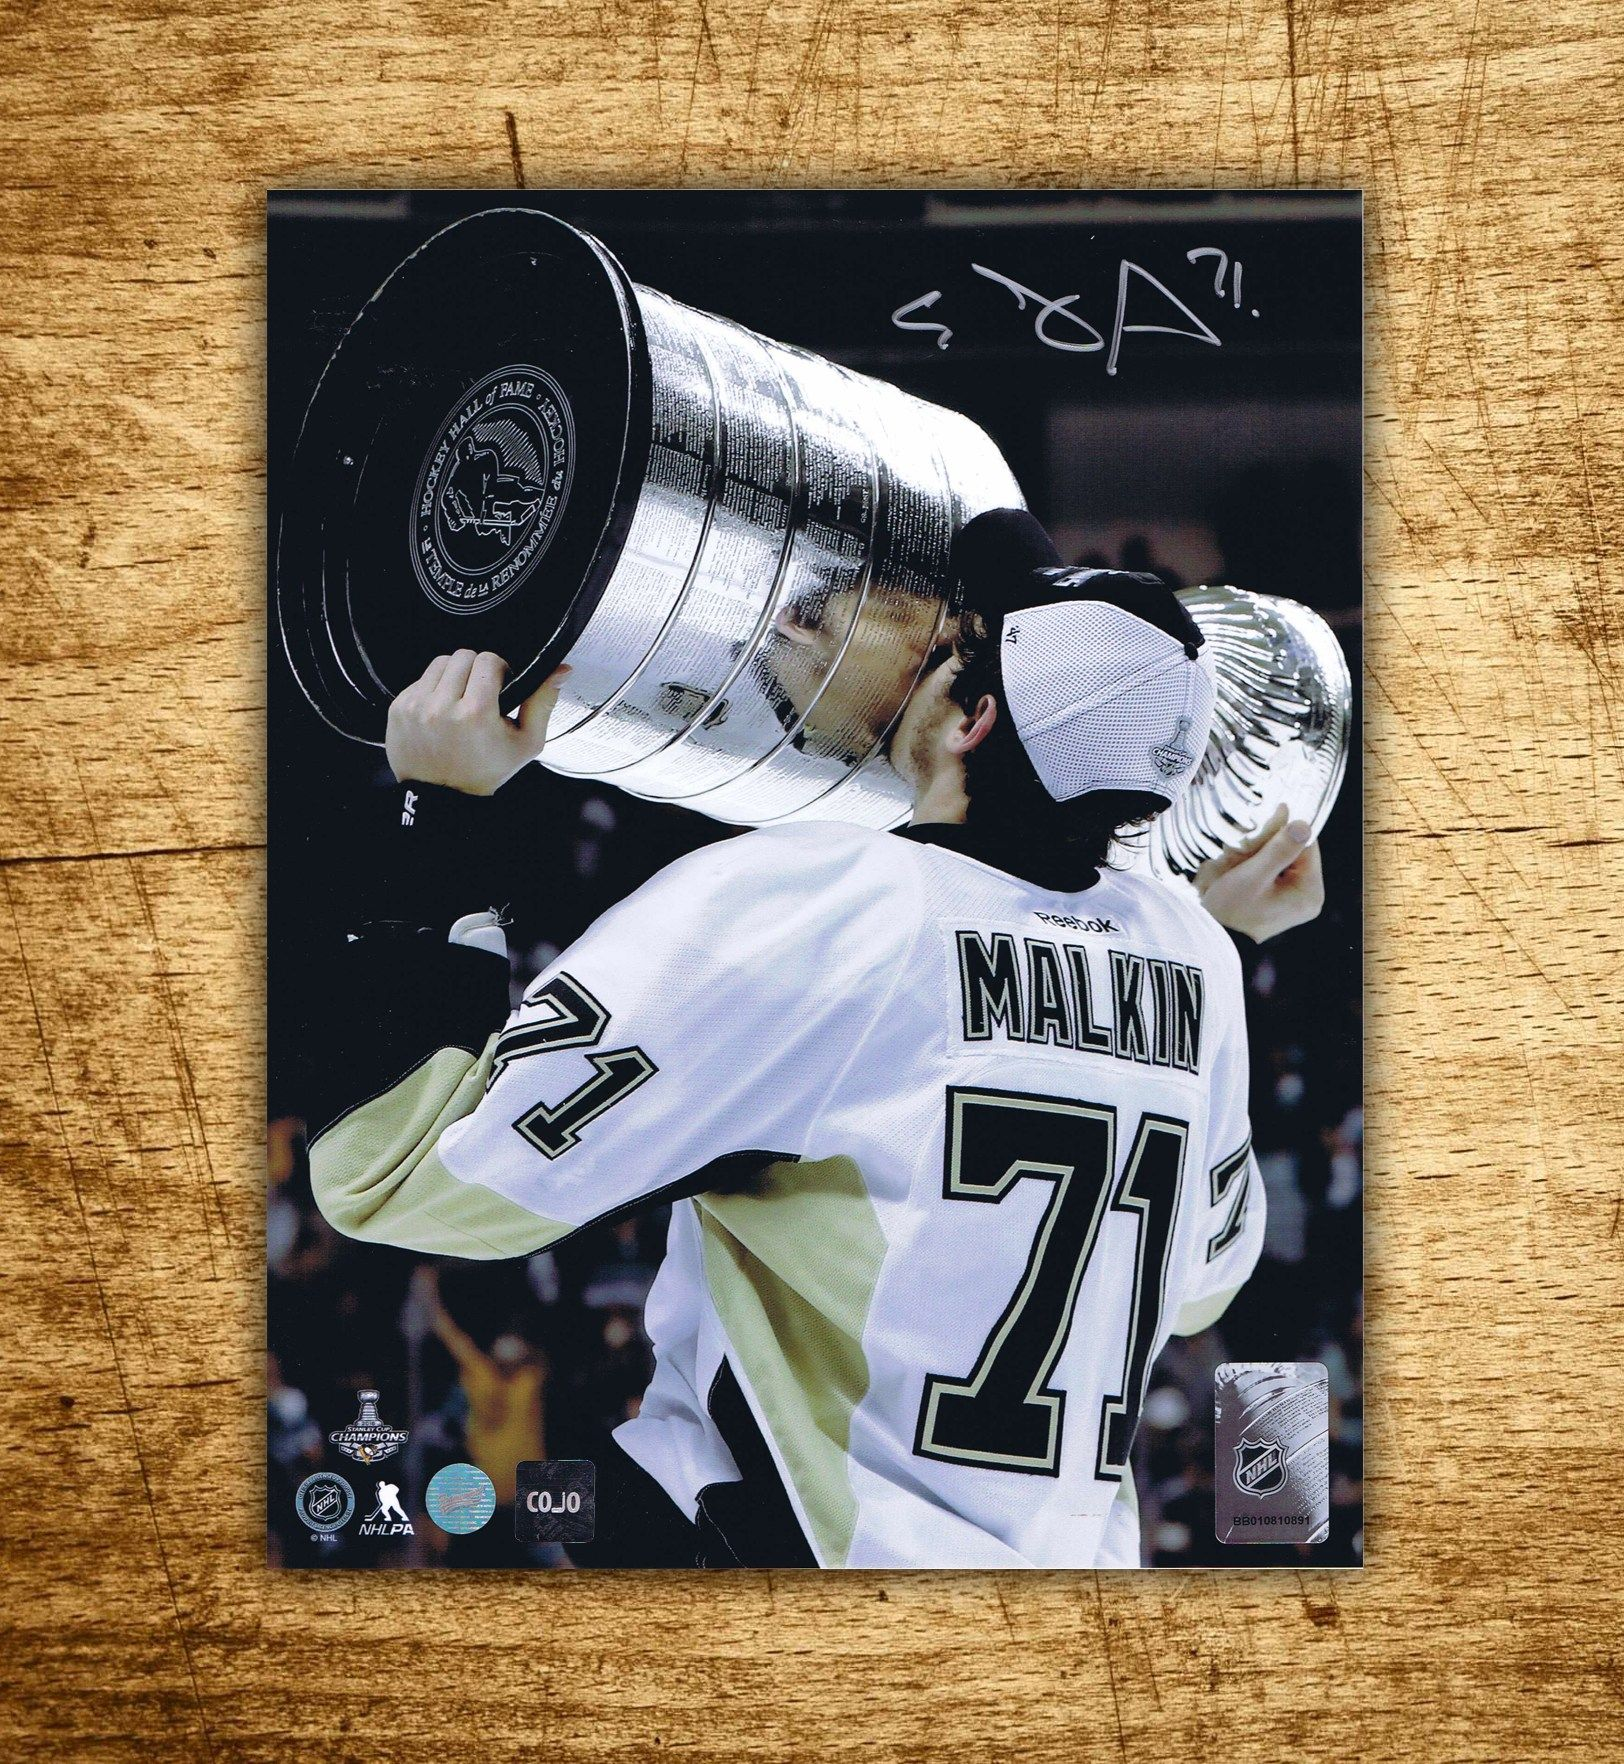 finest selection 410c9 345b7 Evgeni Malkin Pittsburgh Penguins Stanley Cup Autographed ...